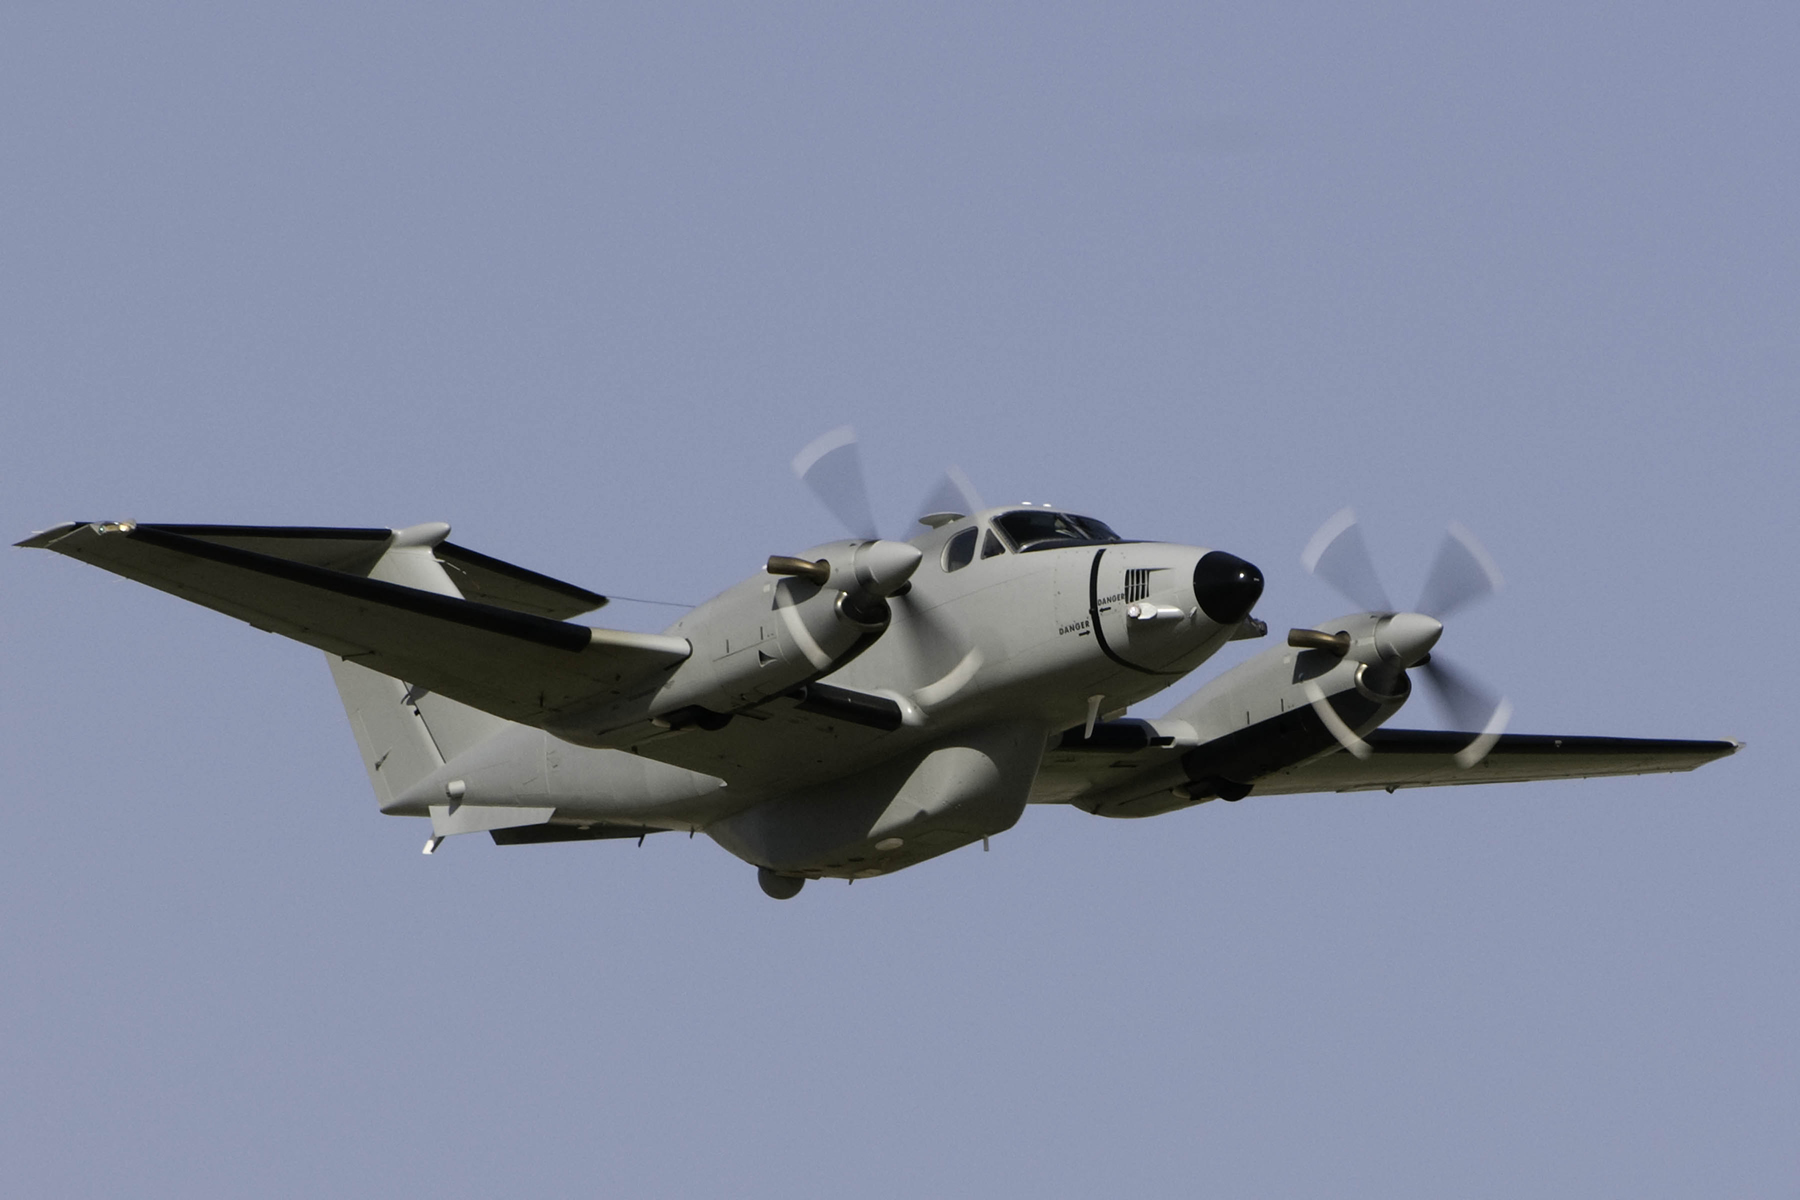 Beechcraft King Air 300 Medium Altitude Reconnaissance and Surveillance System (MARSS) aircraft in U.S. Army service